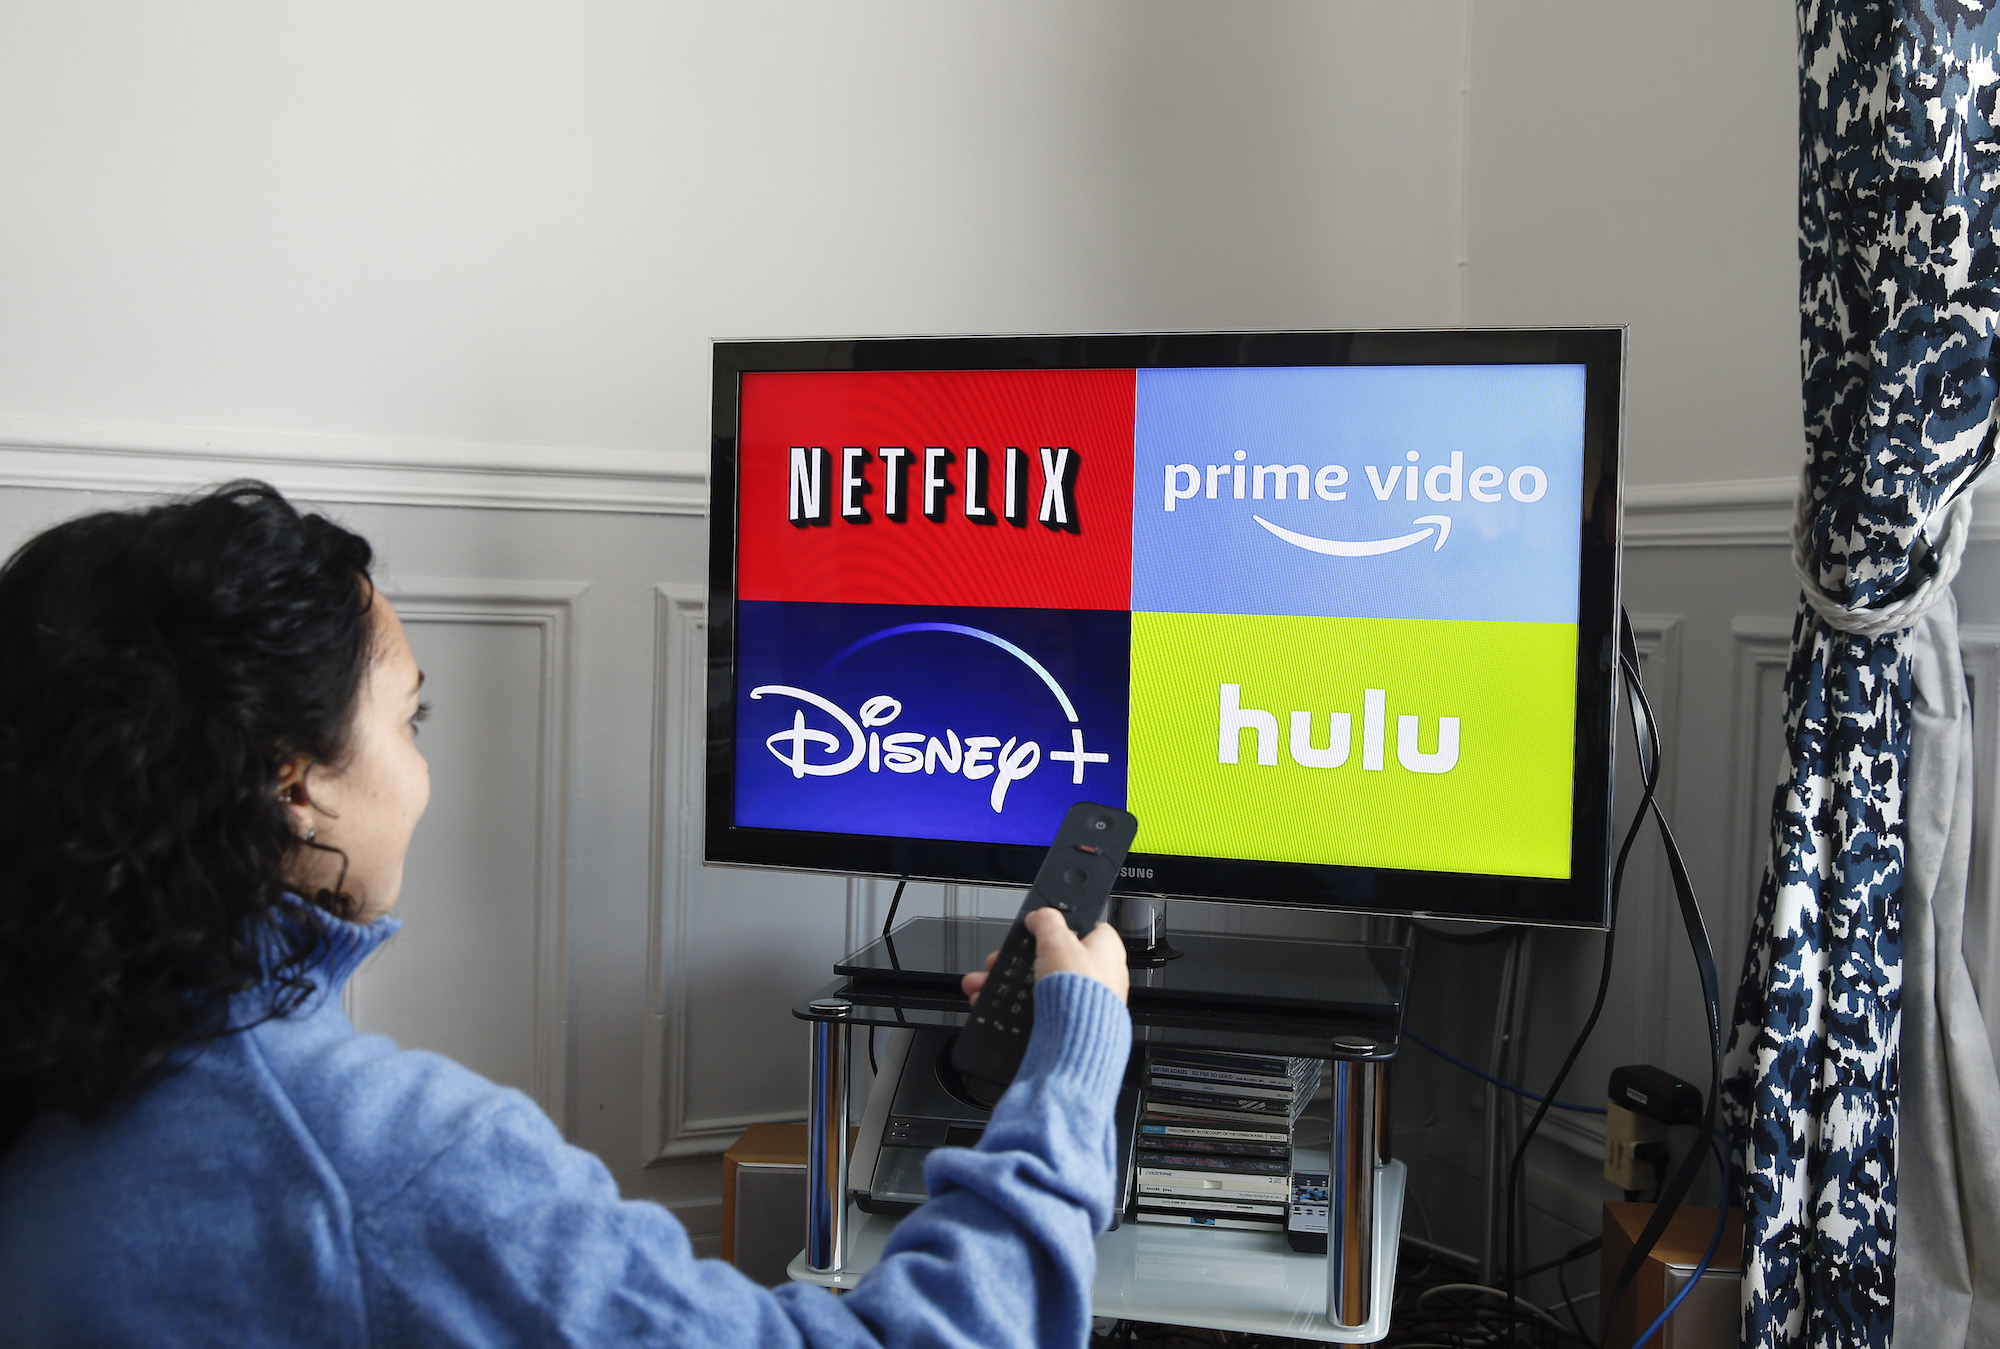 Disney+, Netflix, Hulu, and Amazon Prime logo on a TV